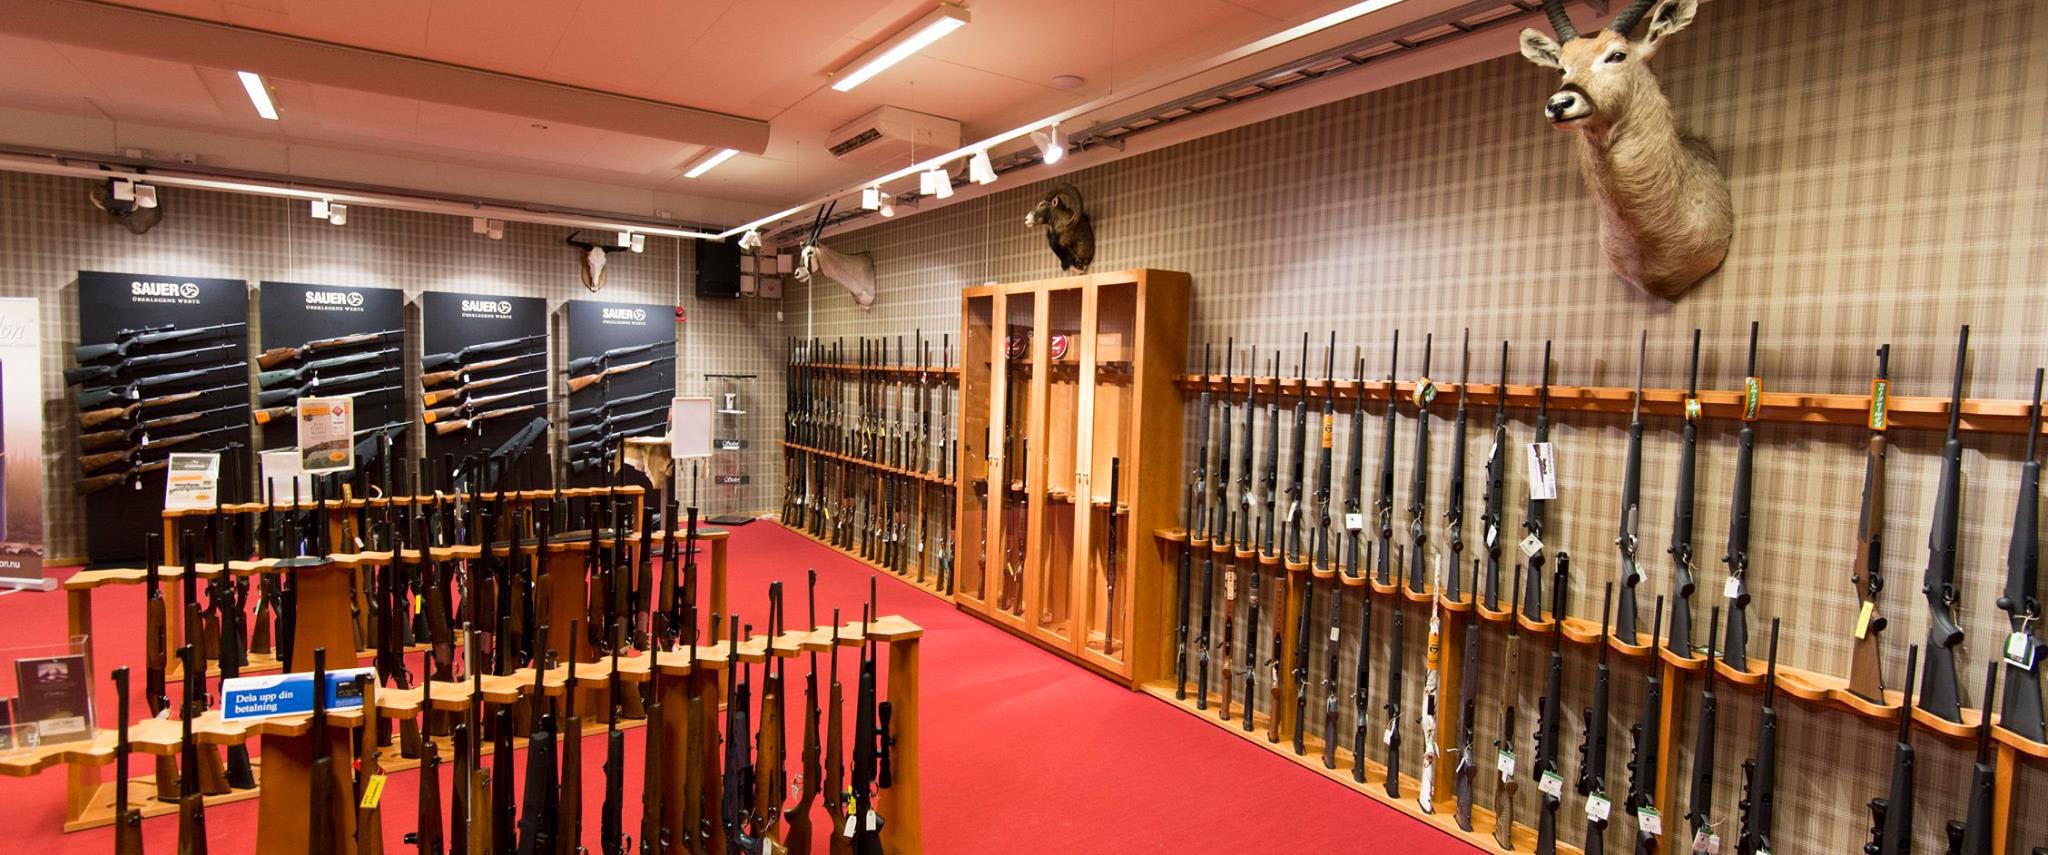 The gun section